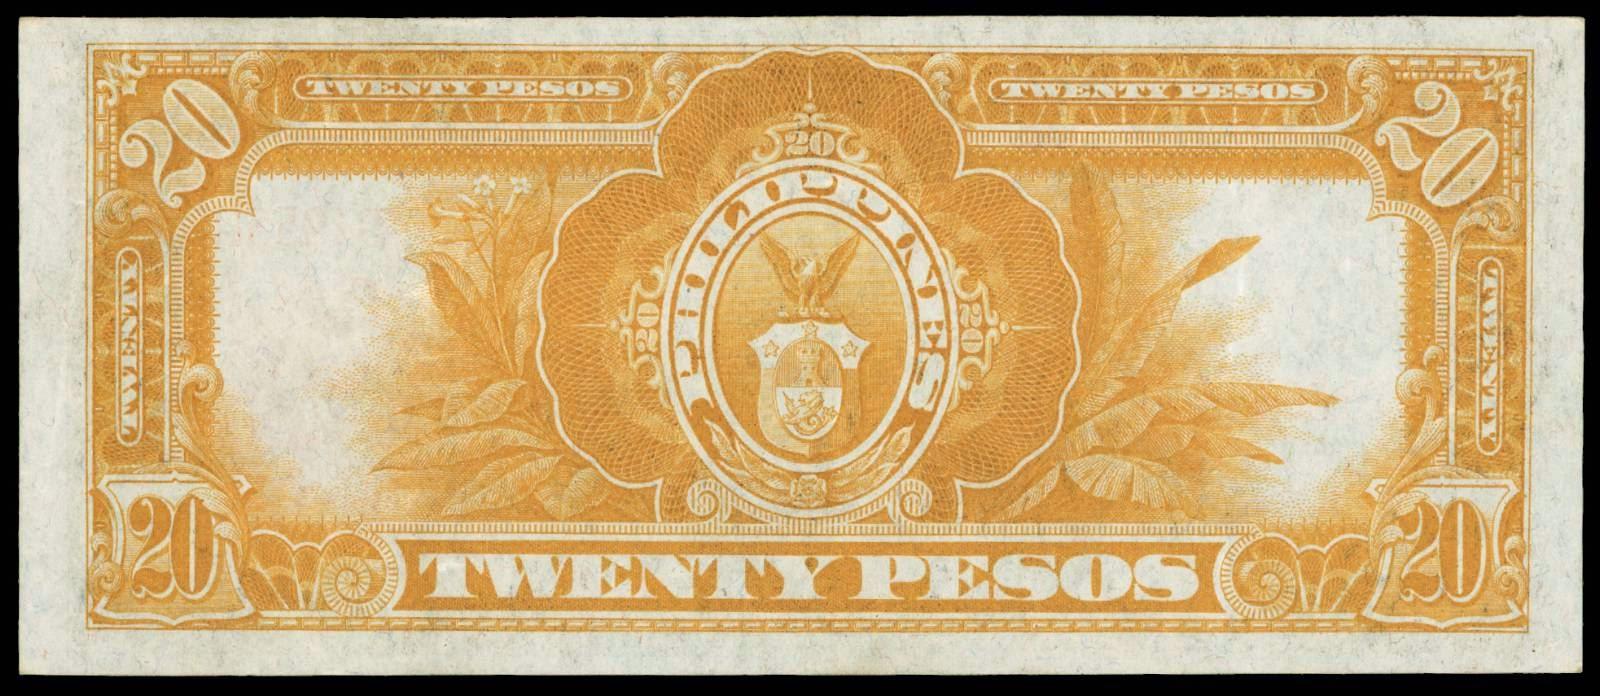 Philippines banknotes 1936 20 Pesos Treasury Certificate